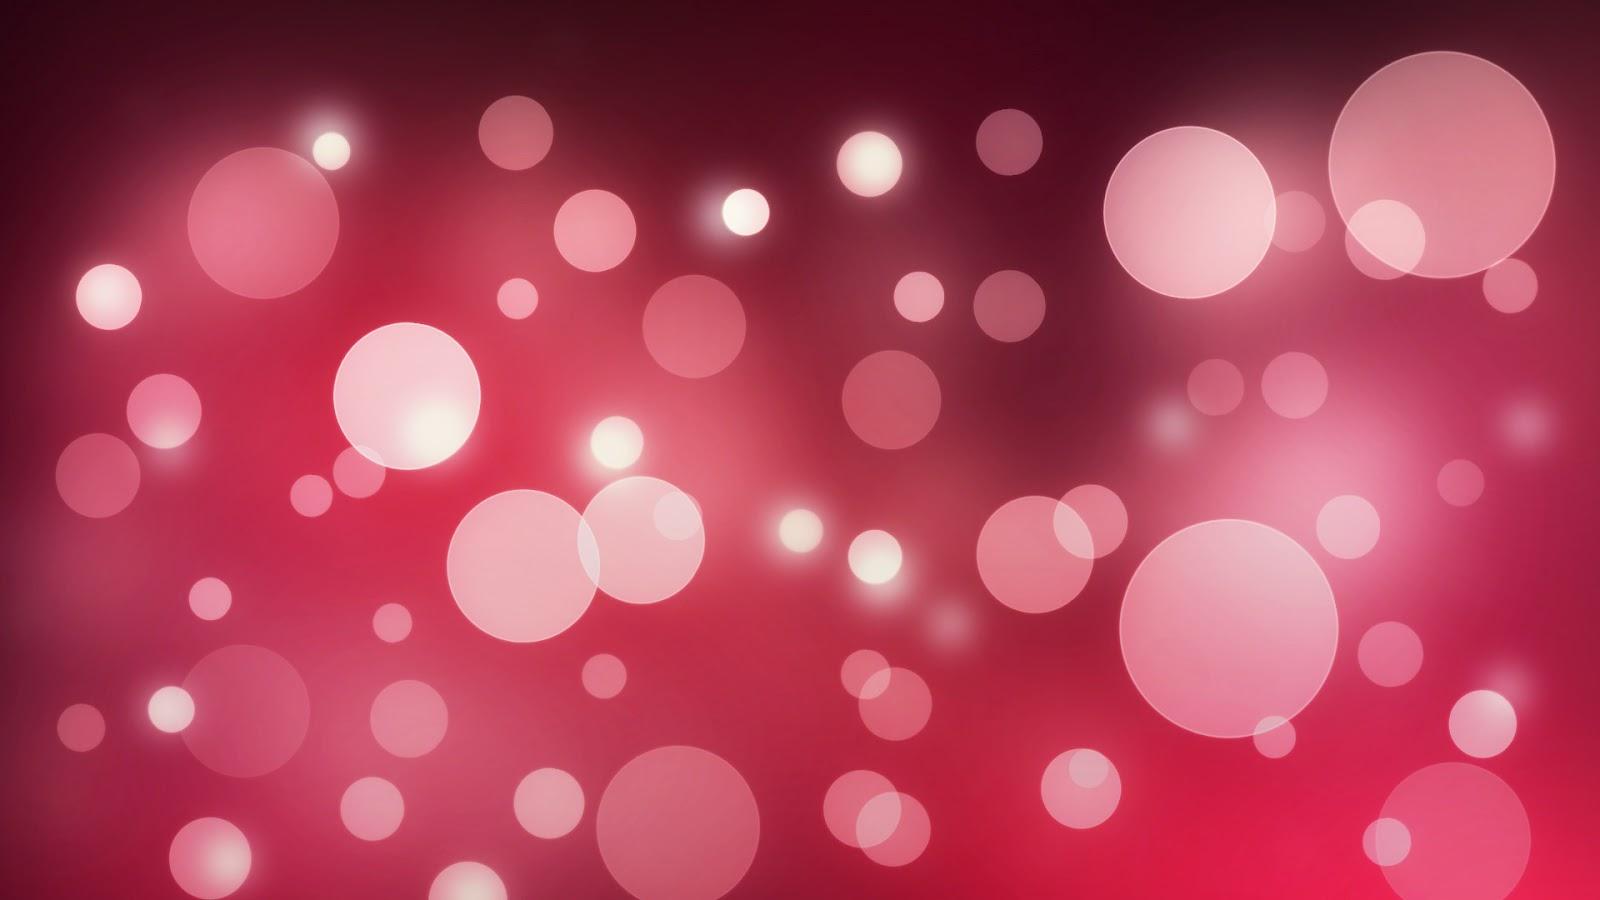 Demi Lovato Tumblr Wallpaper >> Light Red Background Wallpaper - WallpaperSafari